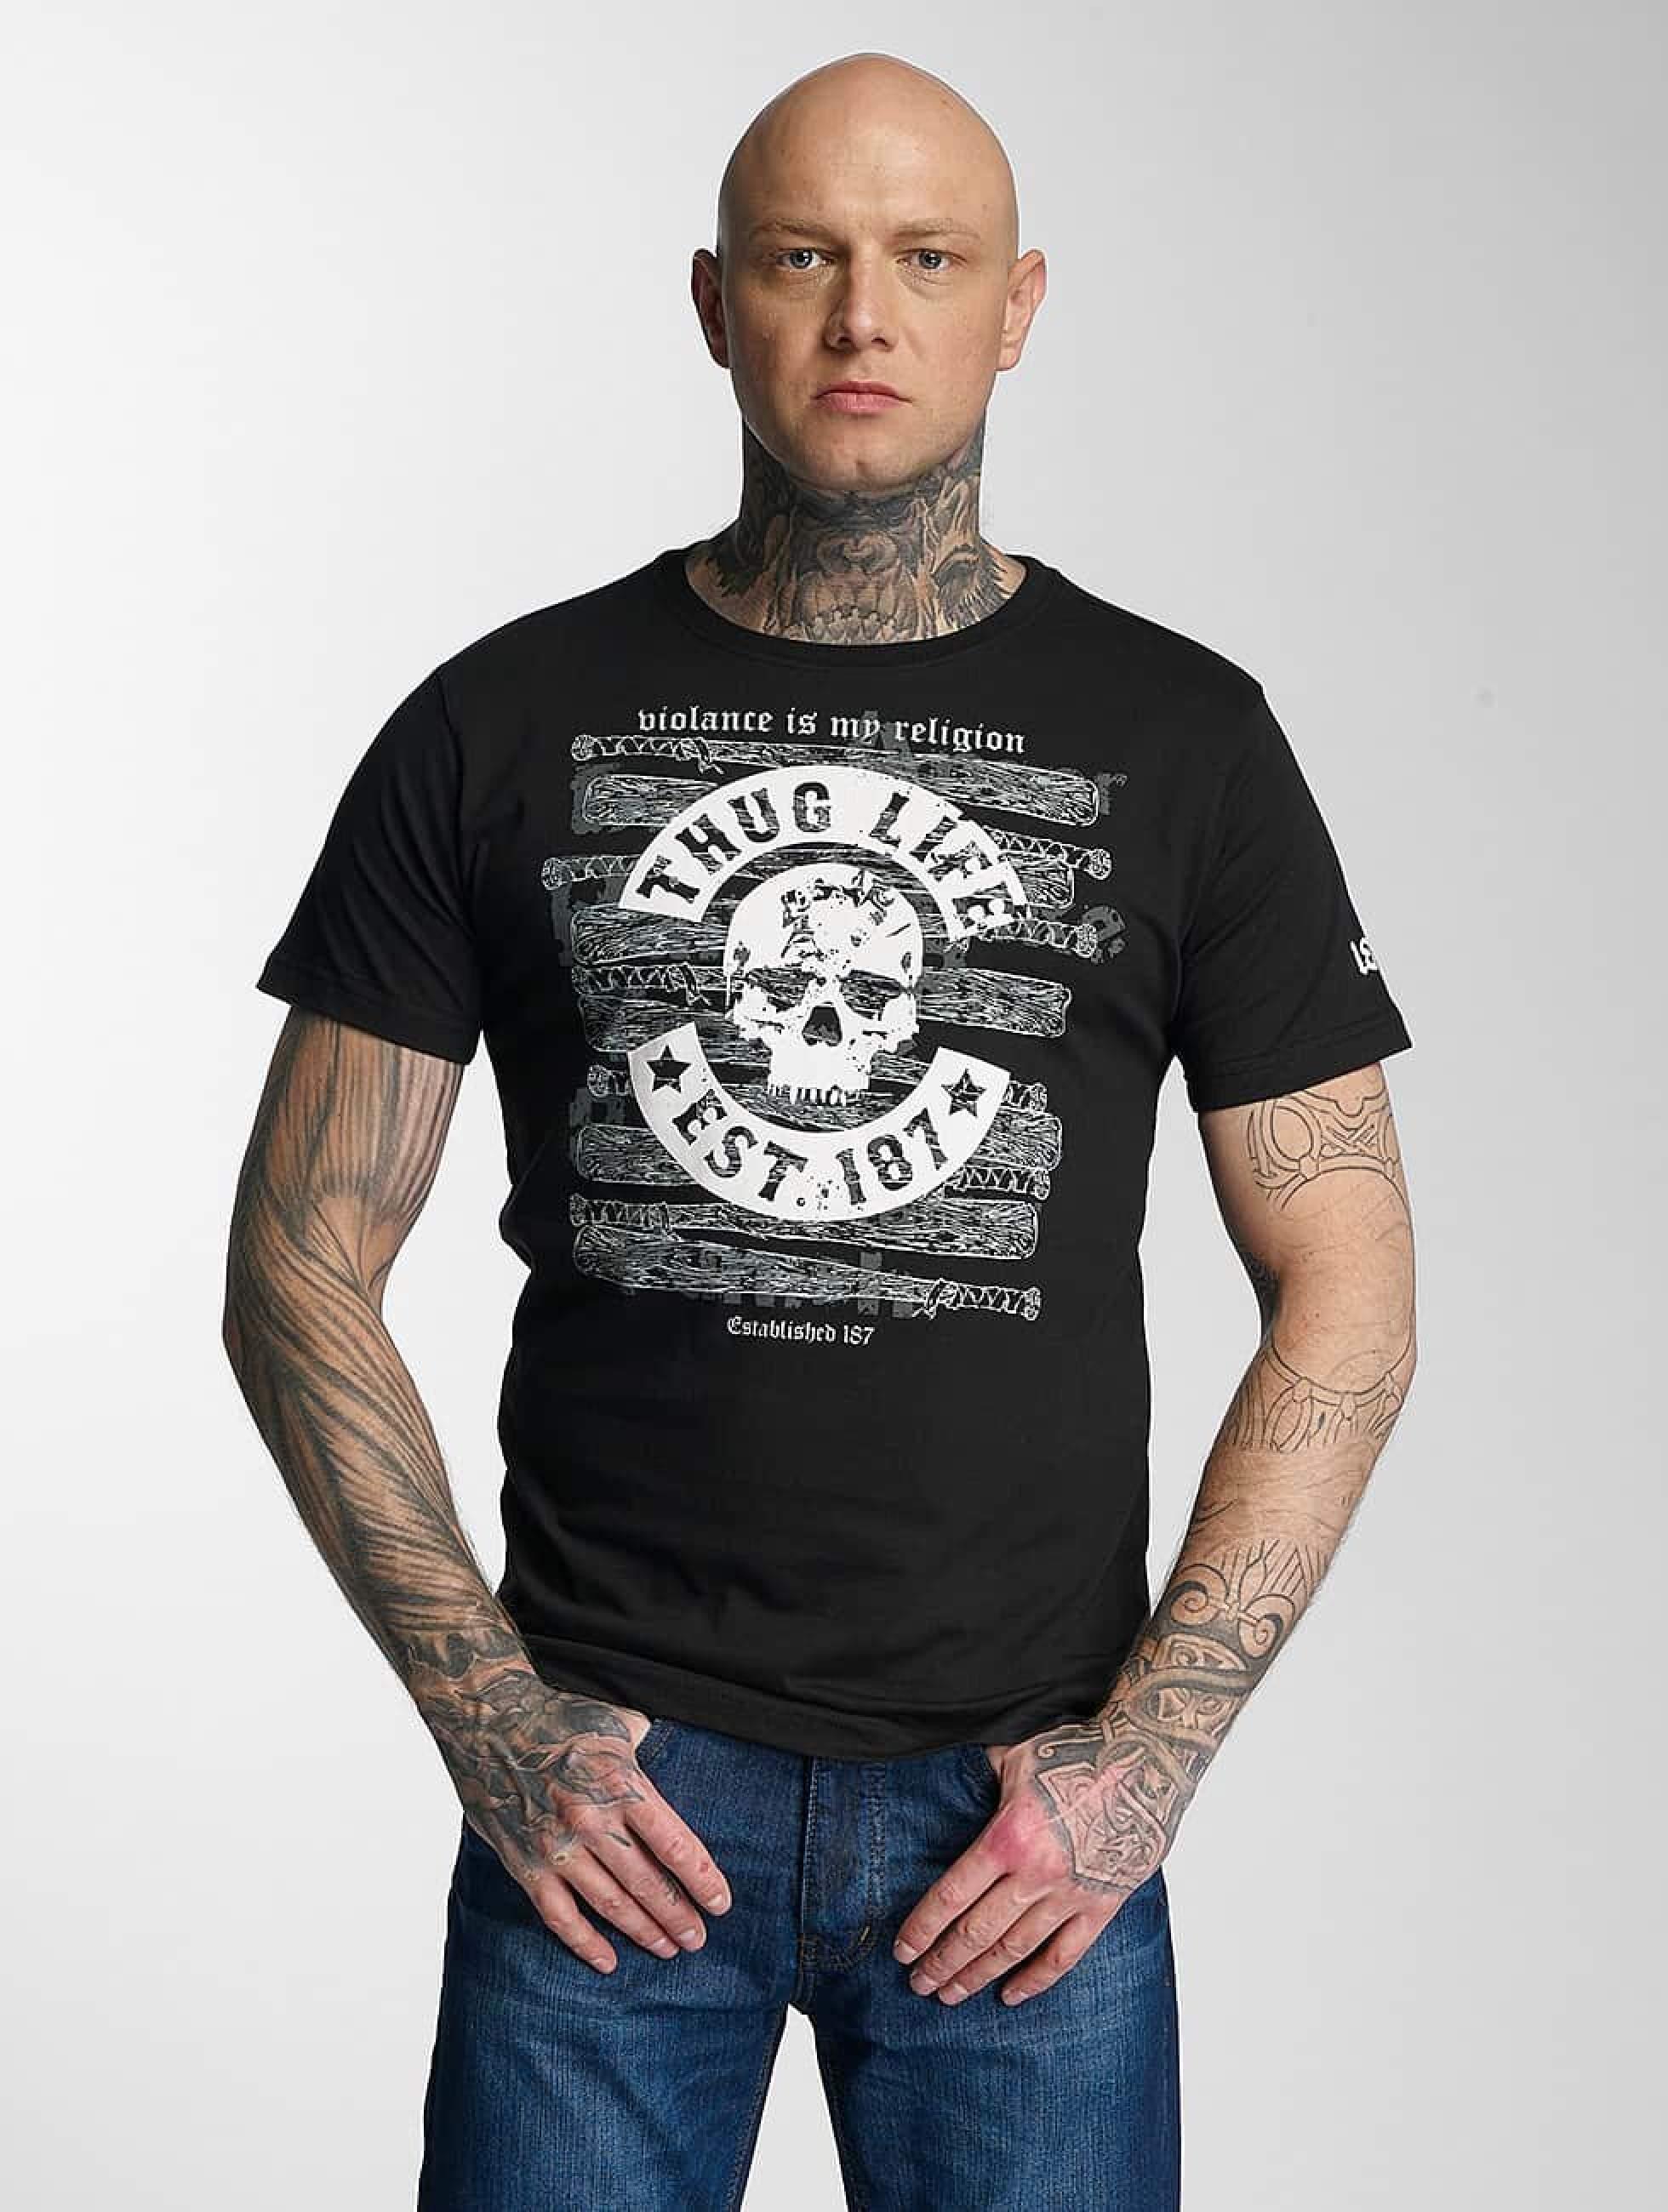 Thug Life / T-Shirt 187 in black S